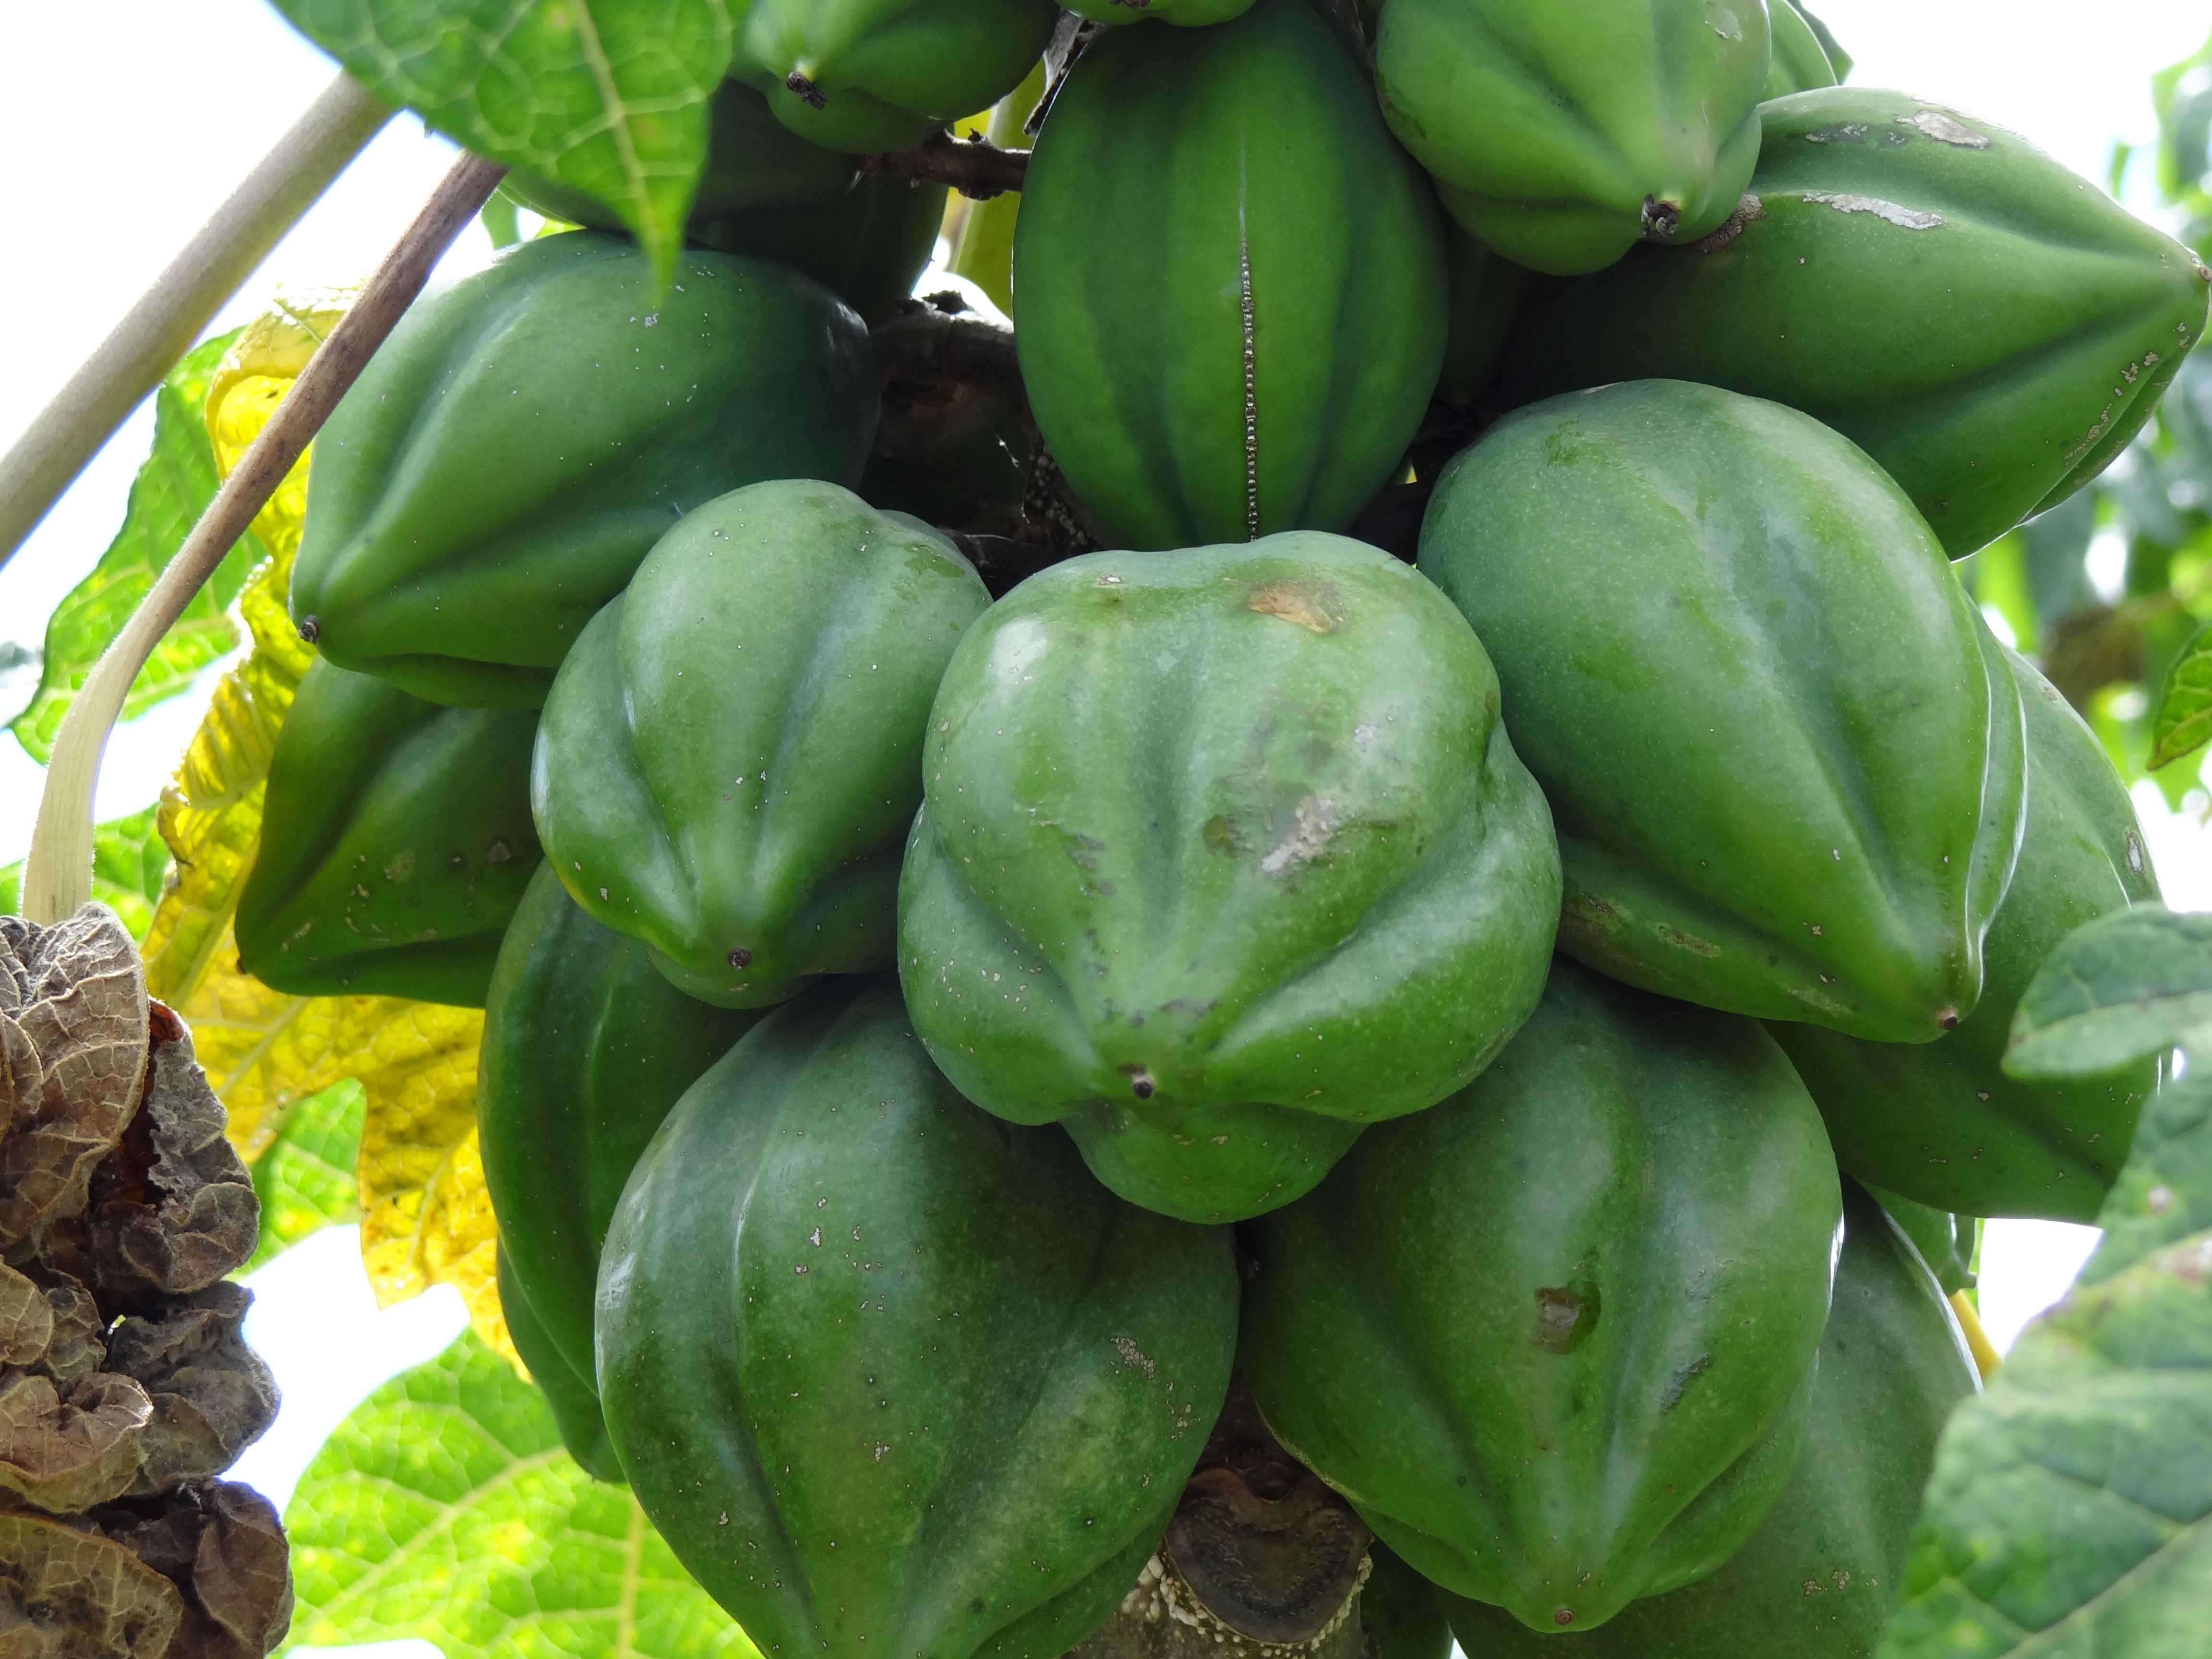 Aaa-papaya-verde-Petrus-wiki.JPG